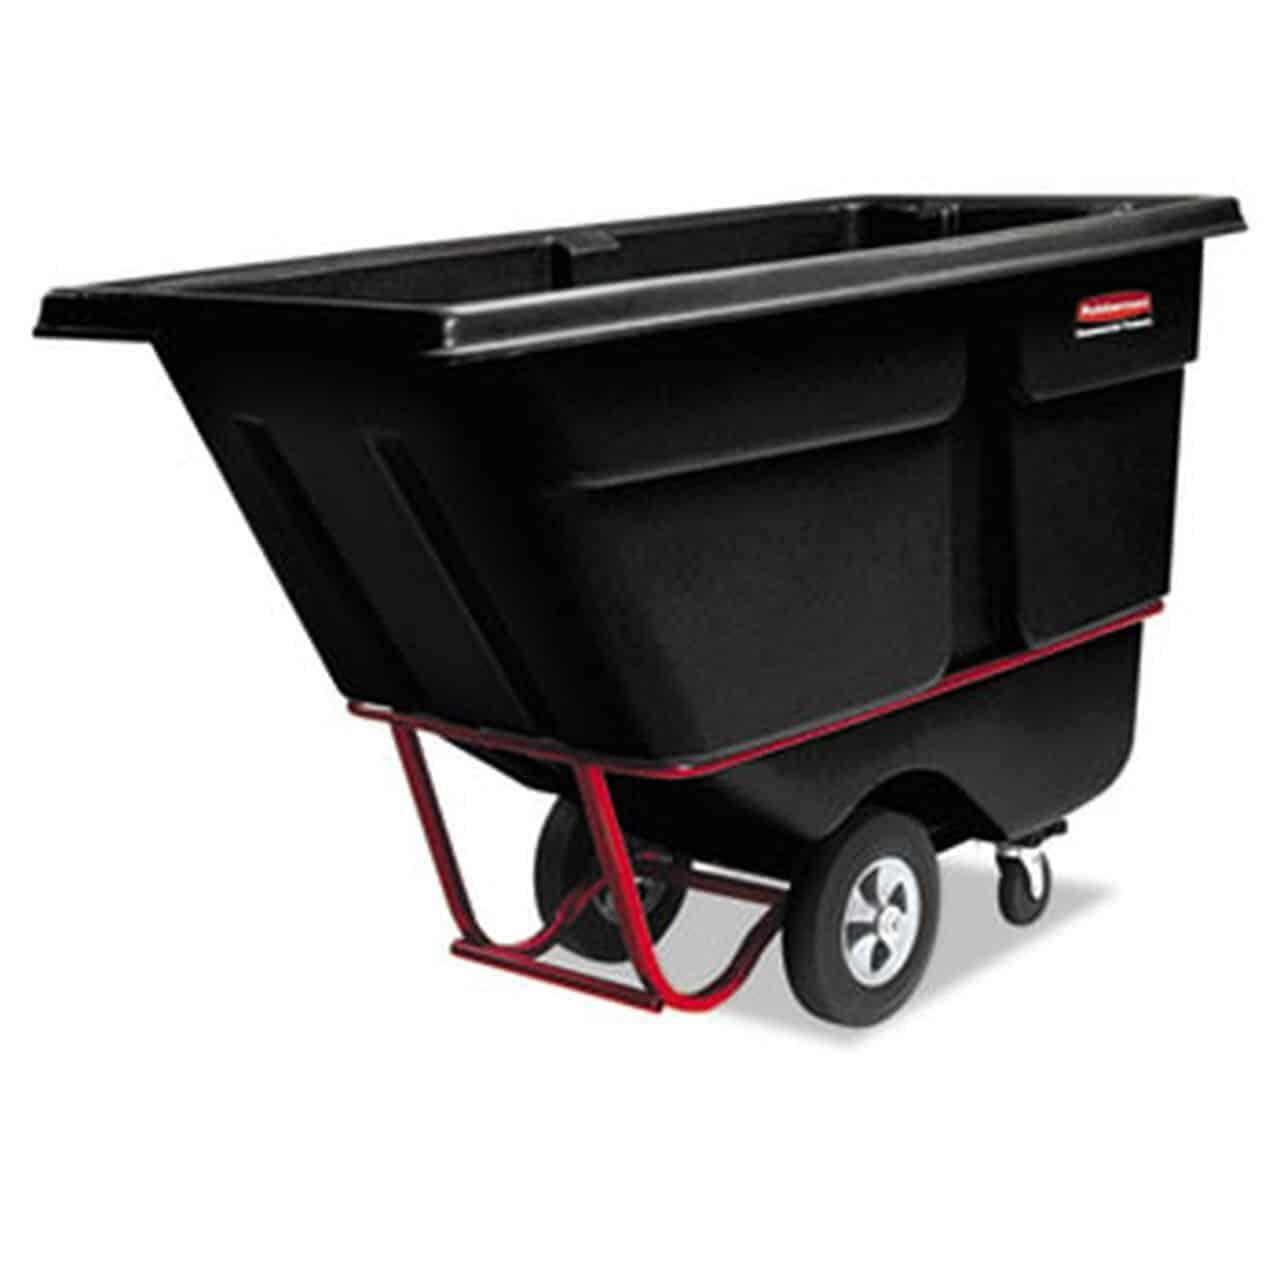 Superior Quality With a Luxor AV Cart